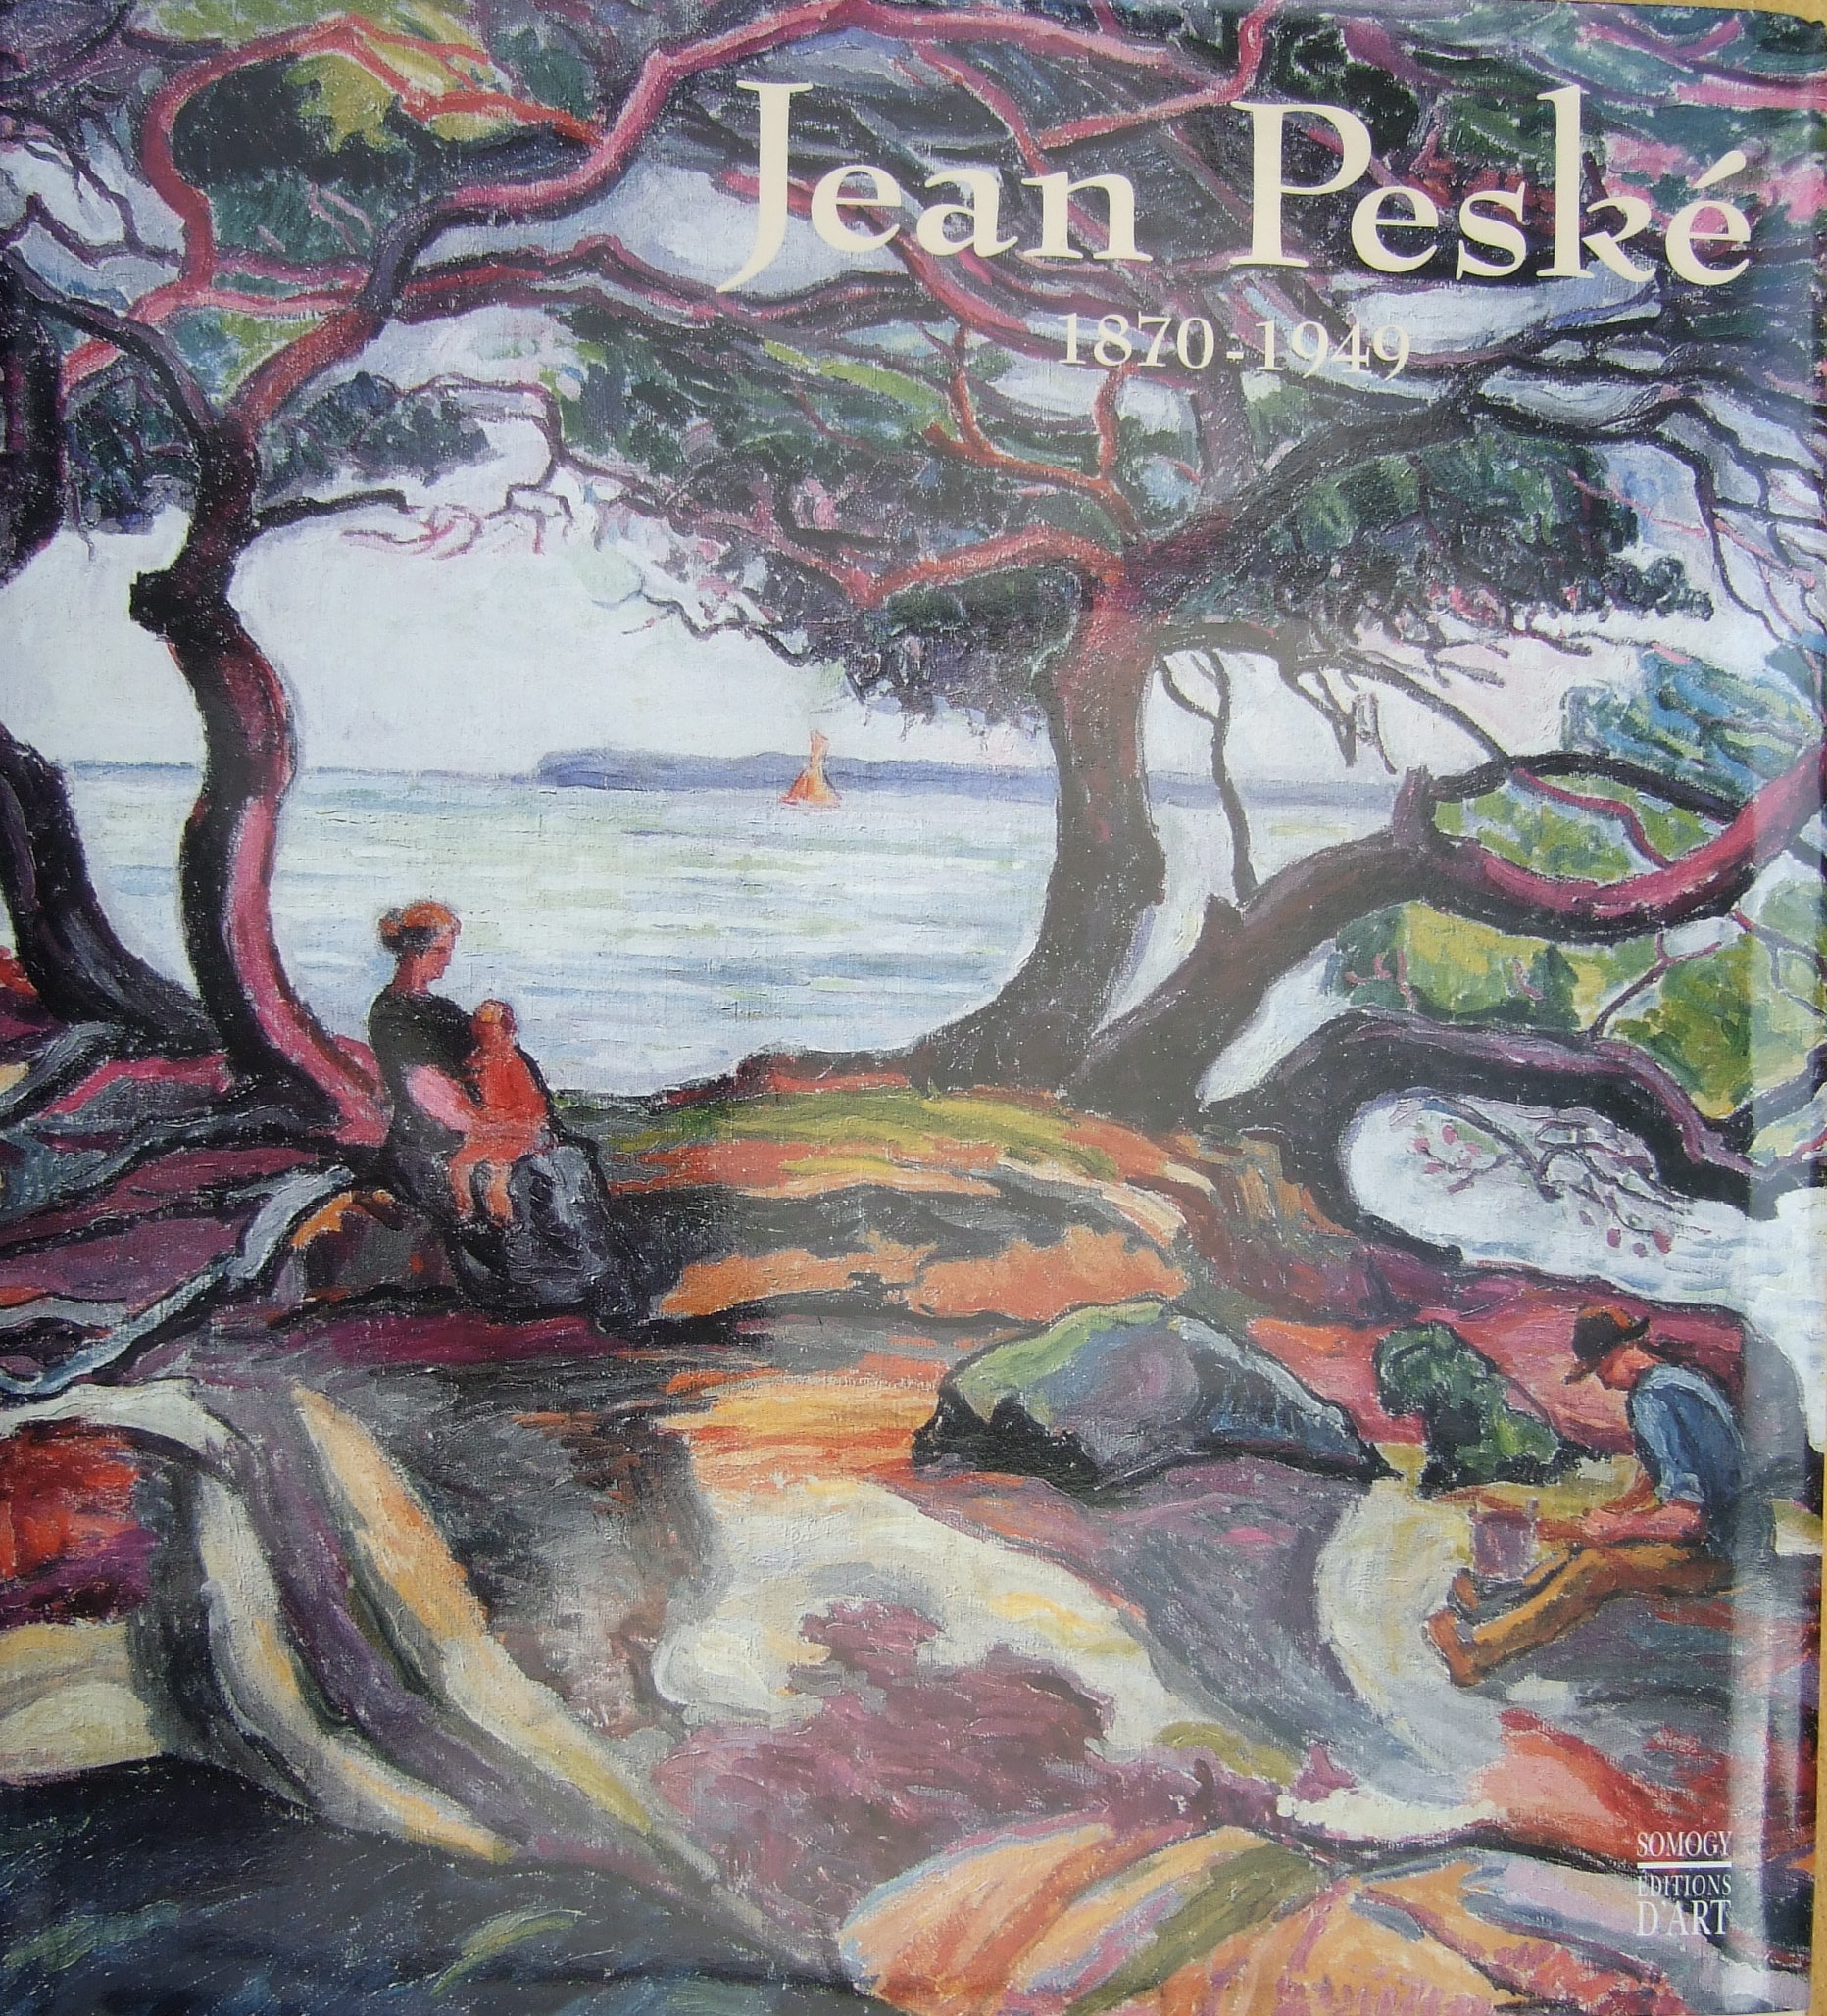 "Book on Jean Peske  Somogy editions d'art, Paris, 2002 ""Jean Peske"""